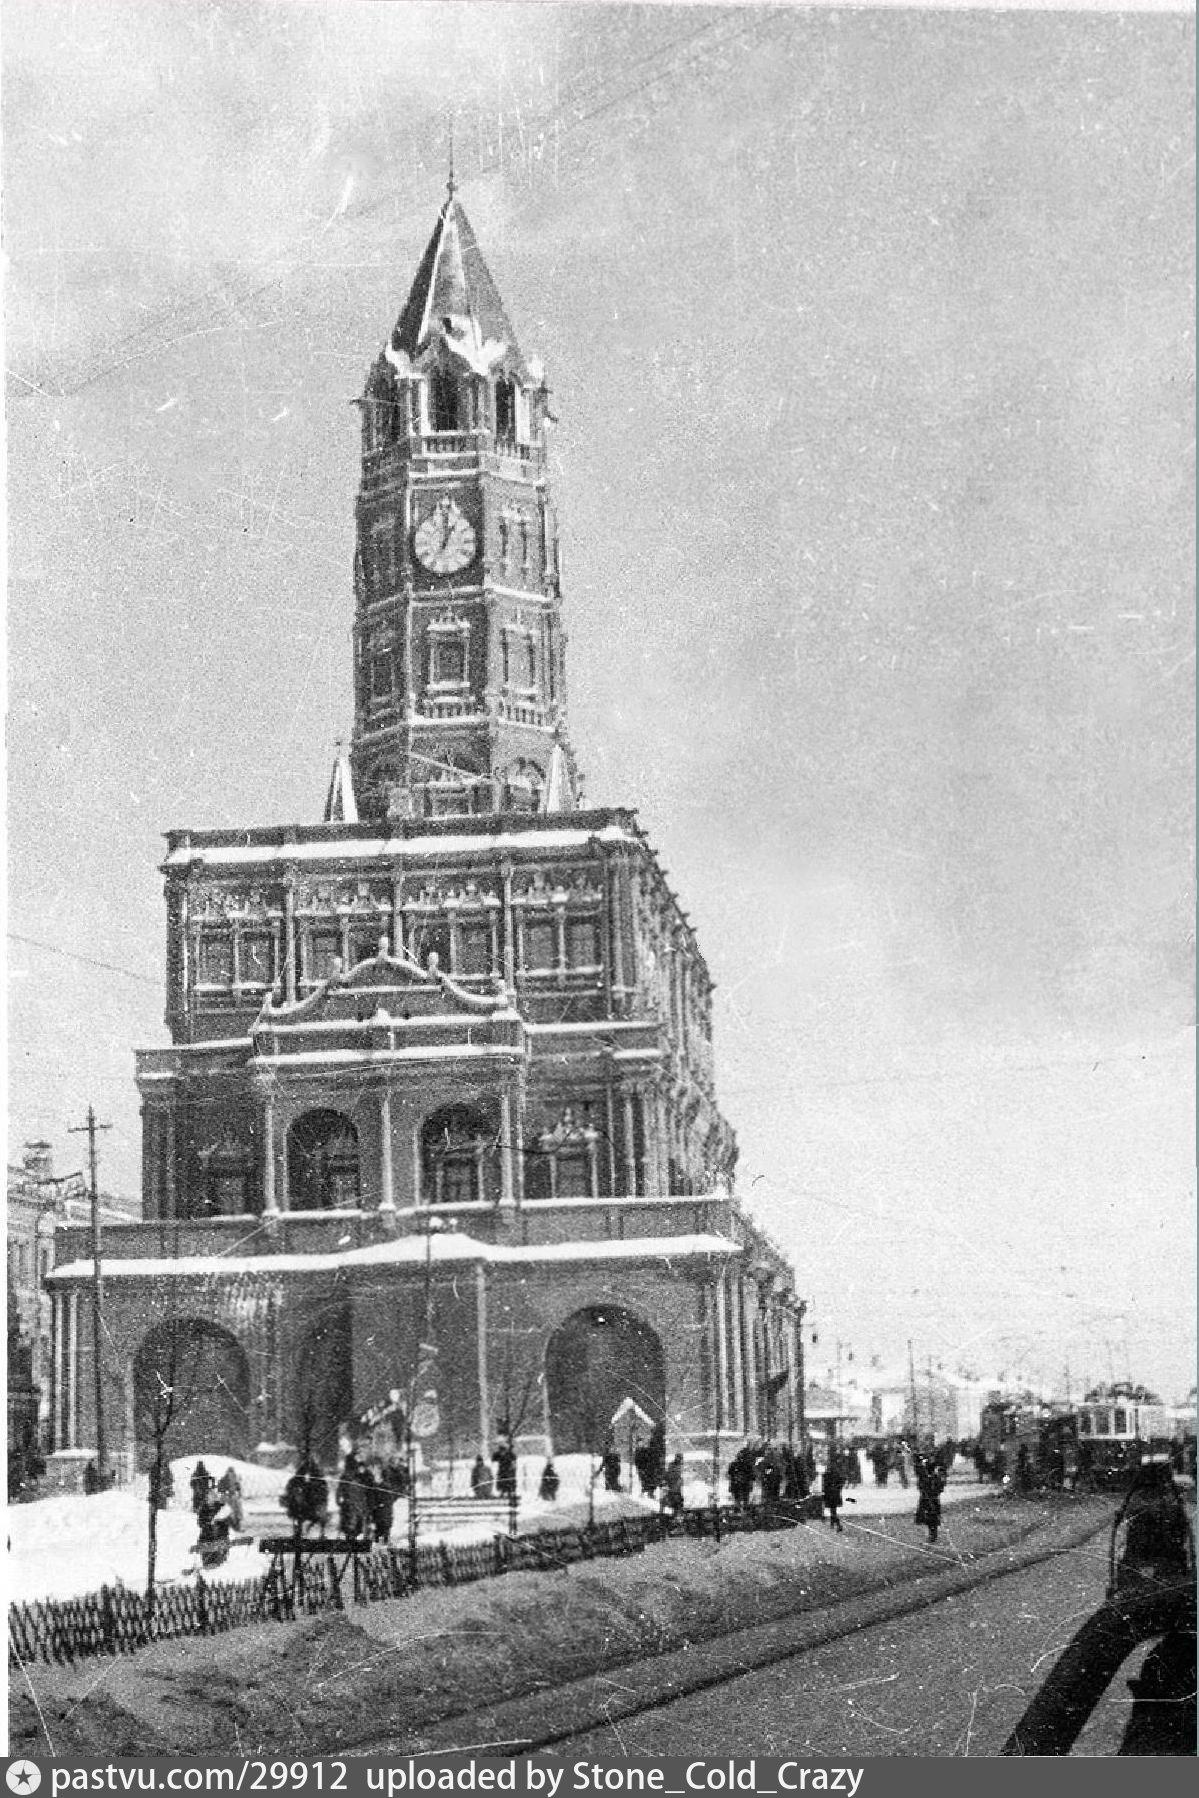 Сухарева башня картинки, рыбацкие